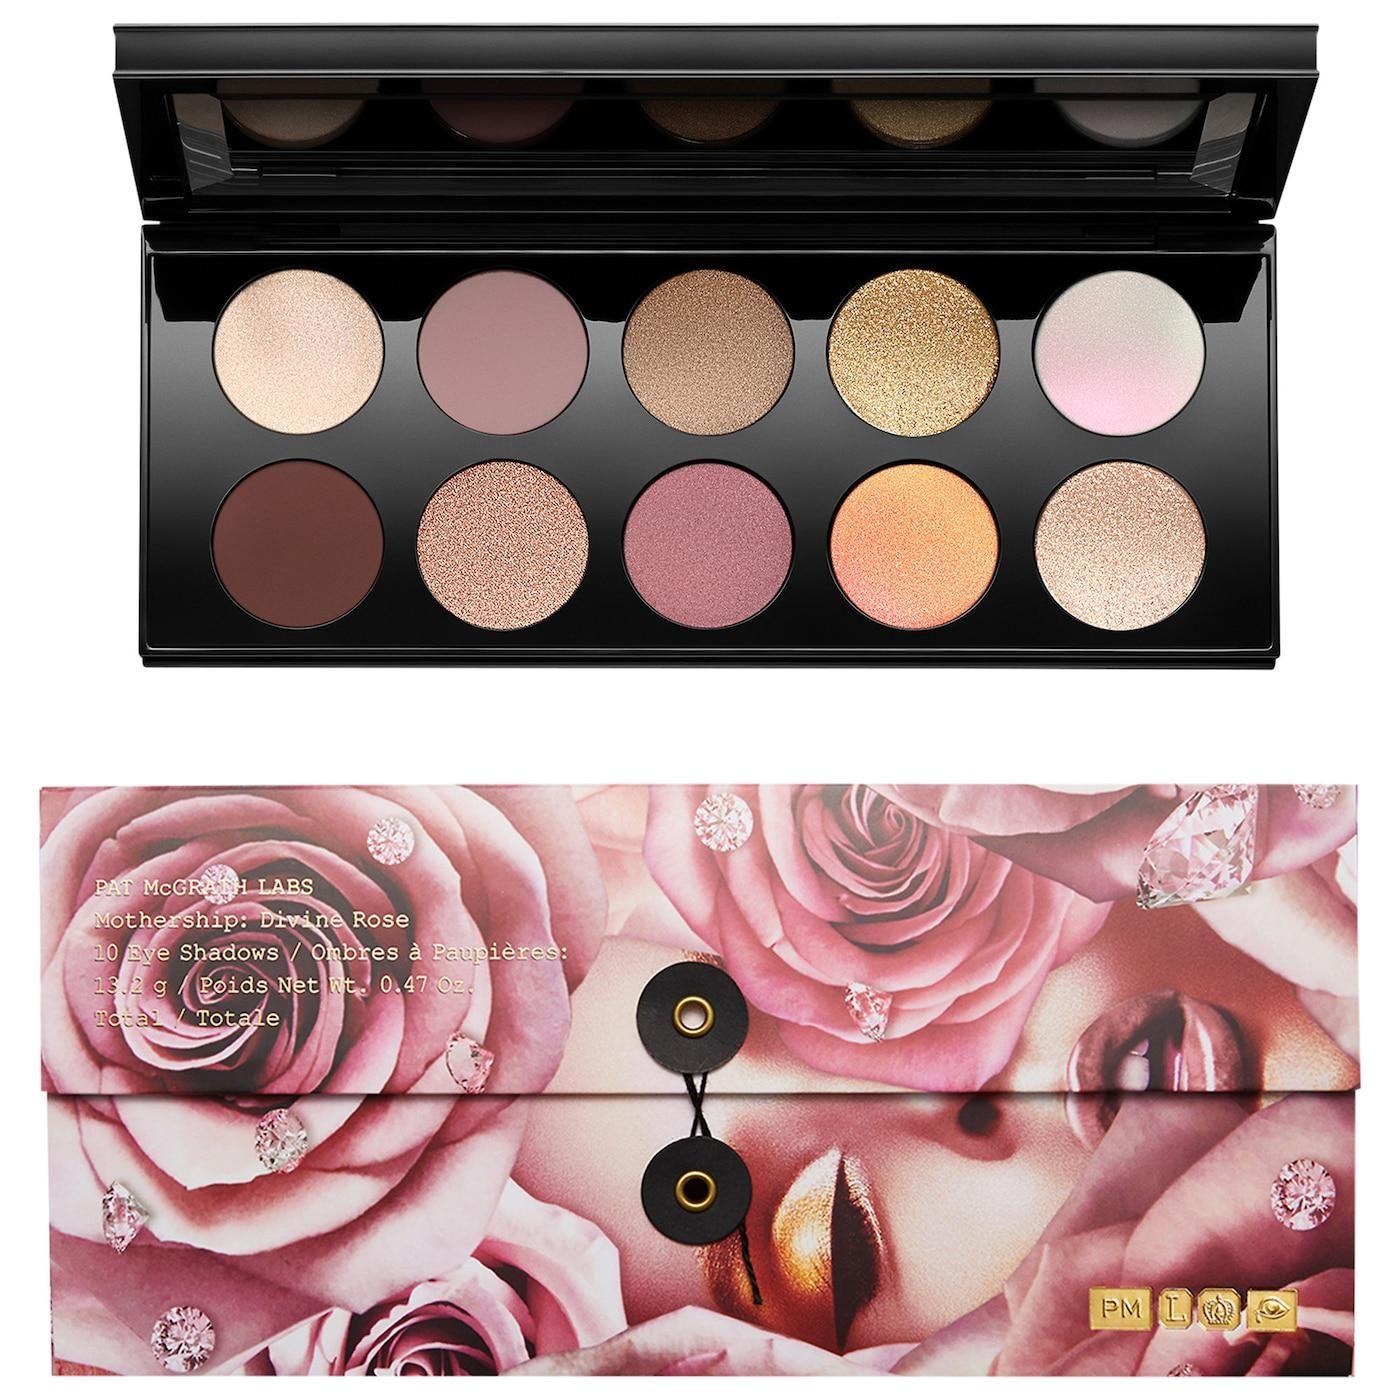 pat mcgrath labs mothership vii eyeshadow palette divine rose collection